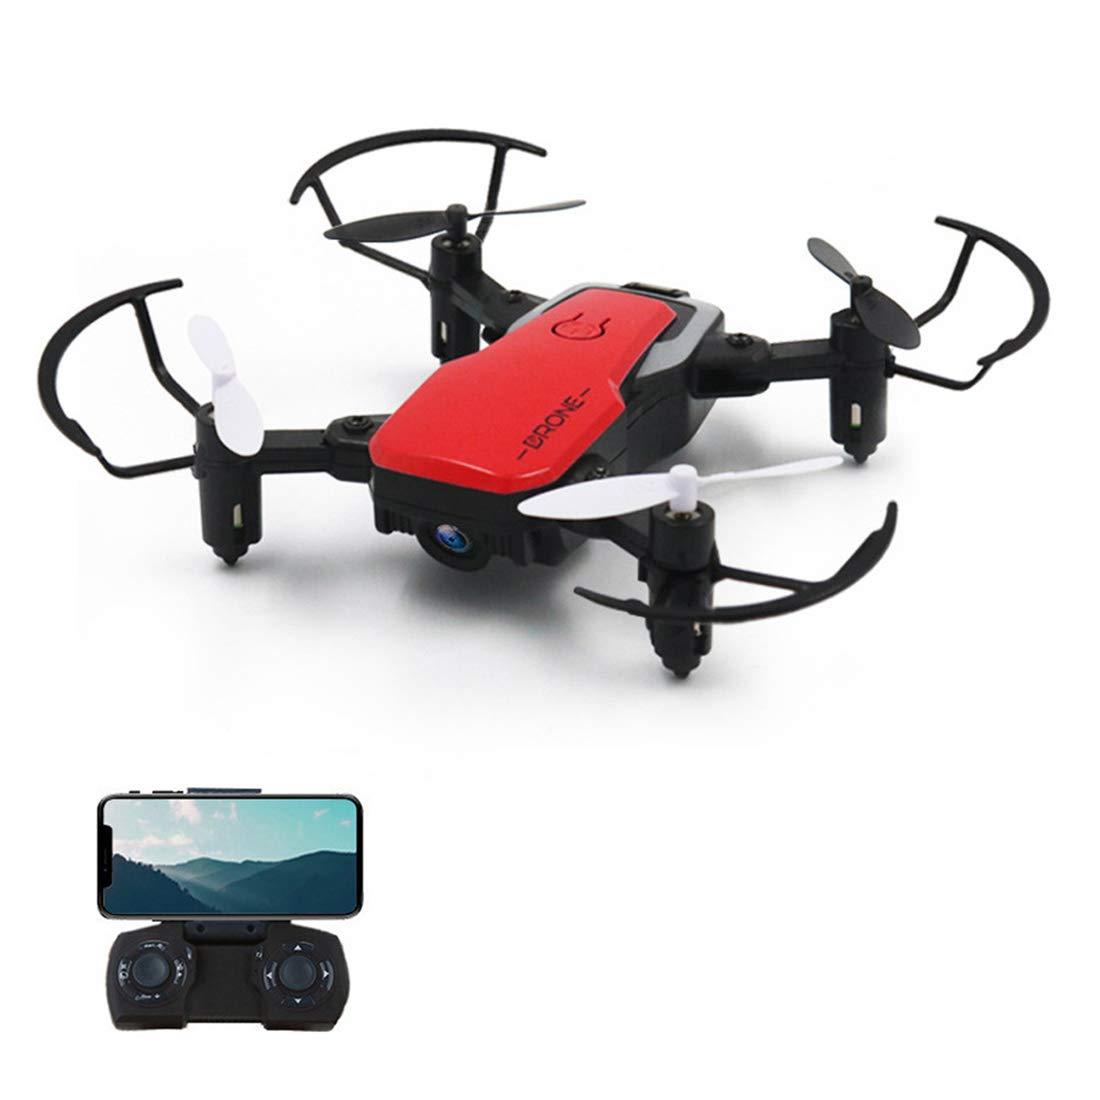 Zgifts Gravity Sensing Control Faltige RC-RDrone mit HD-Kamera-Portable Drones 2.4G Hubschrauber ausgestattet mit Headless-System, One Key Return, WiFi-Kamera, Rot